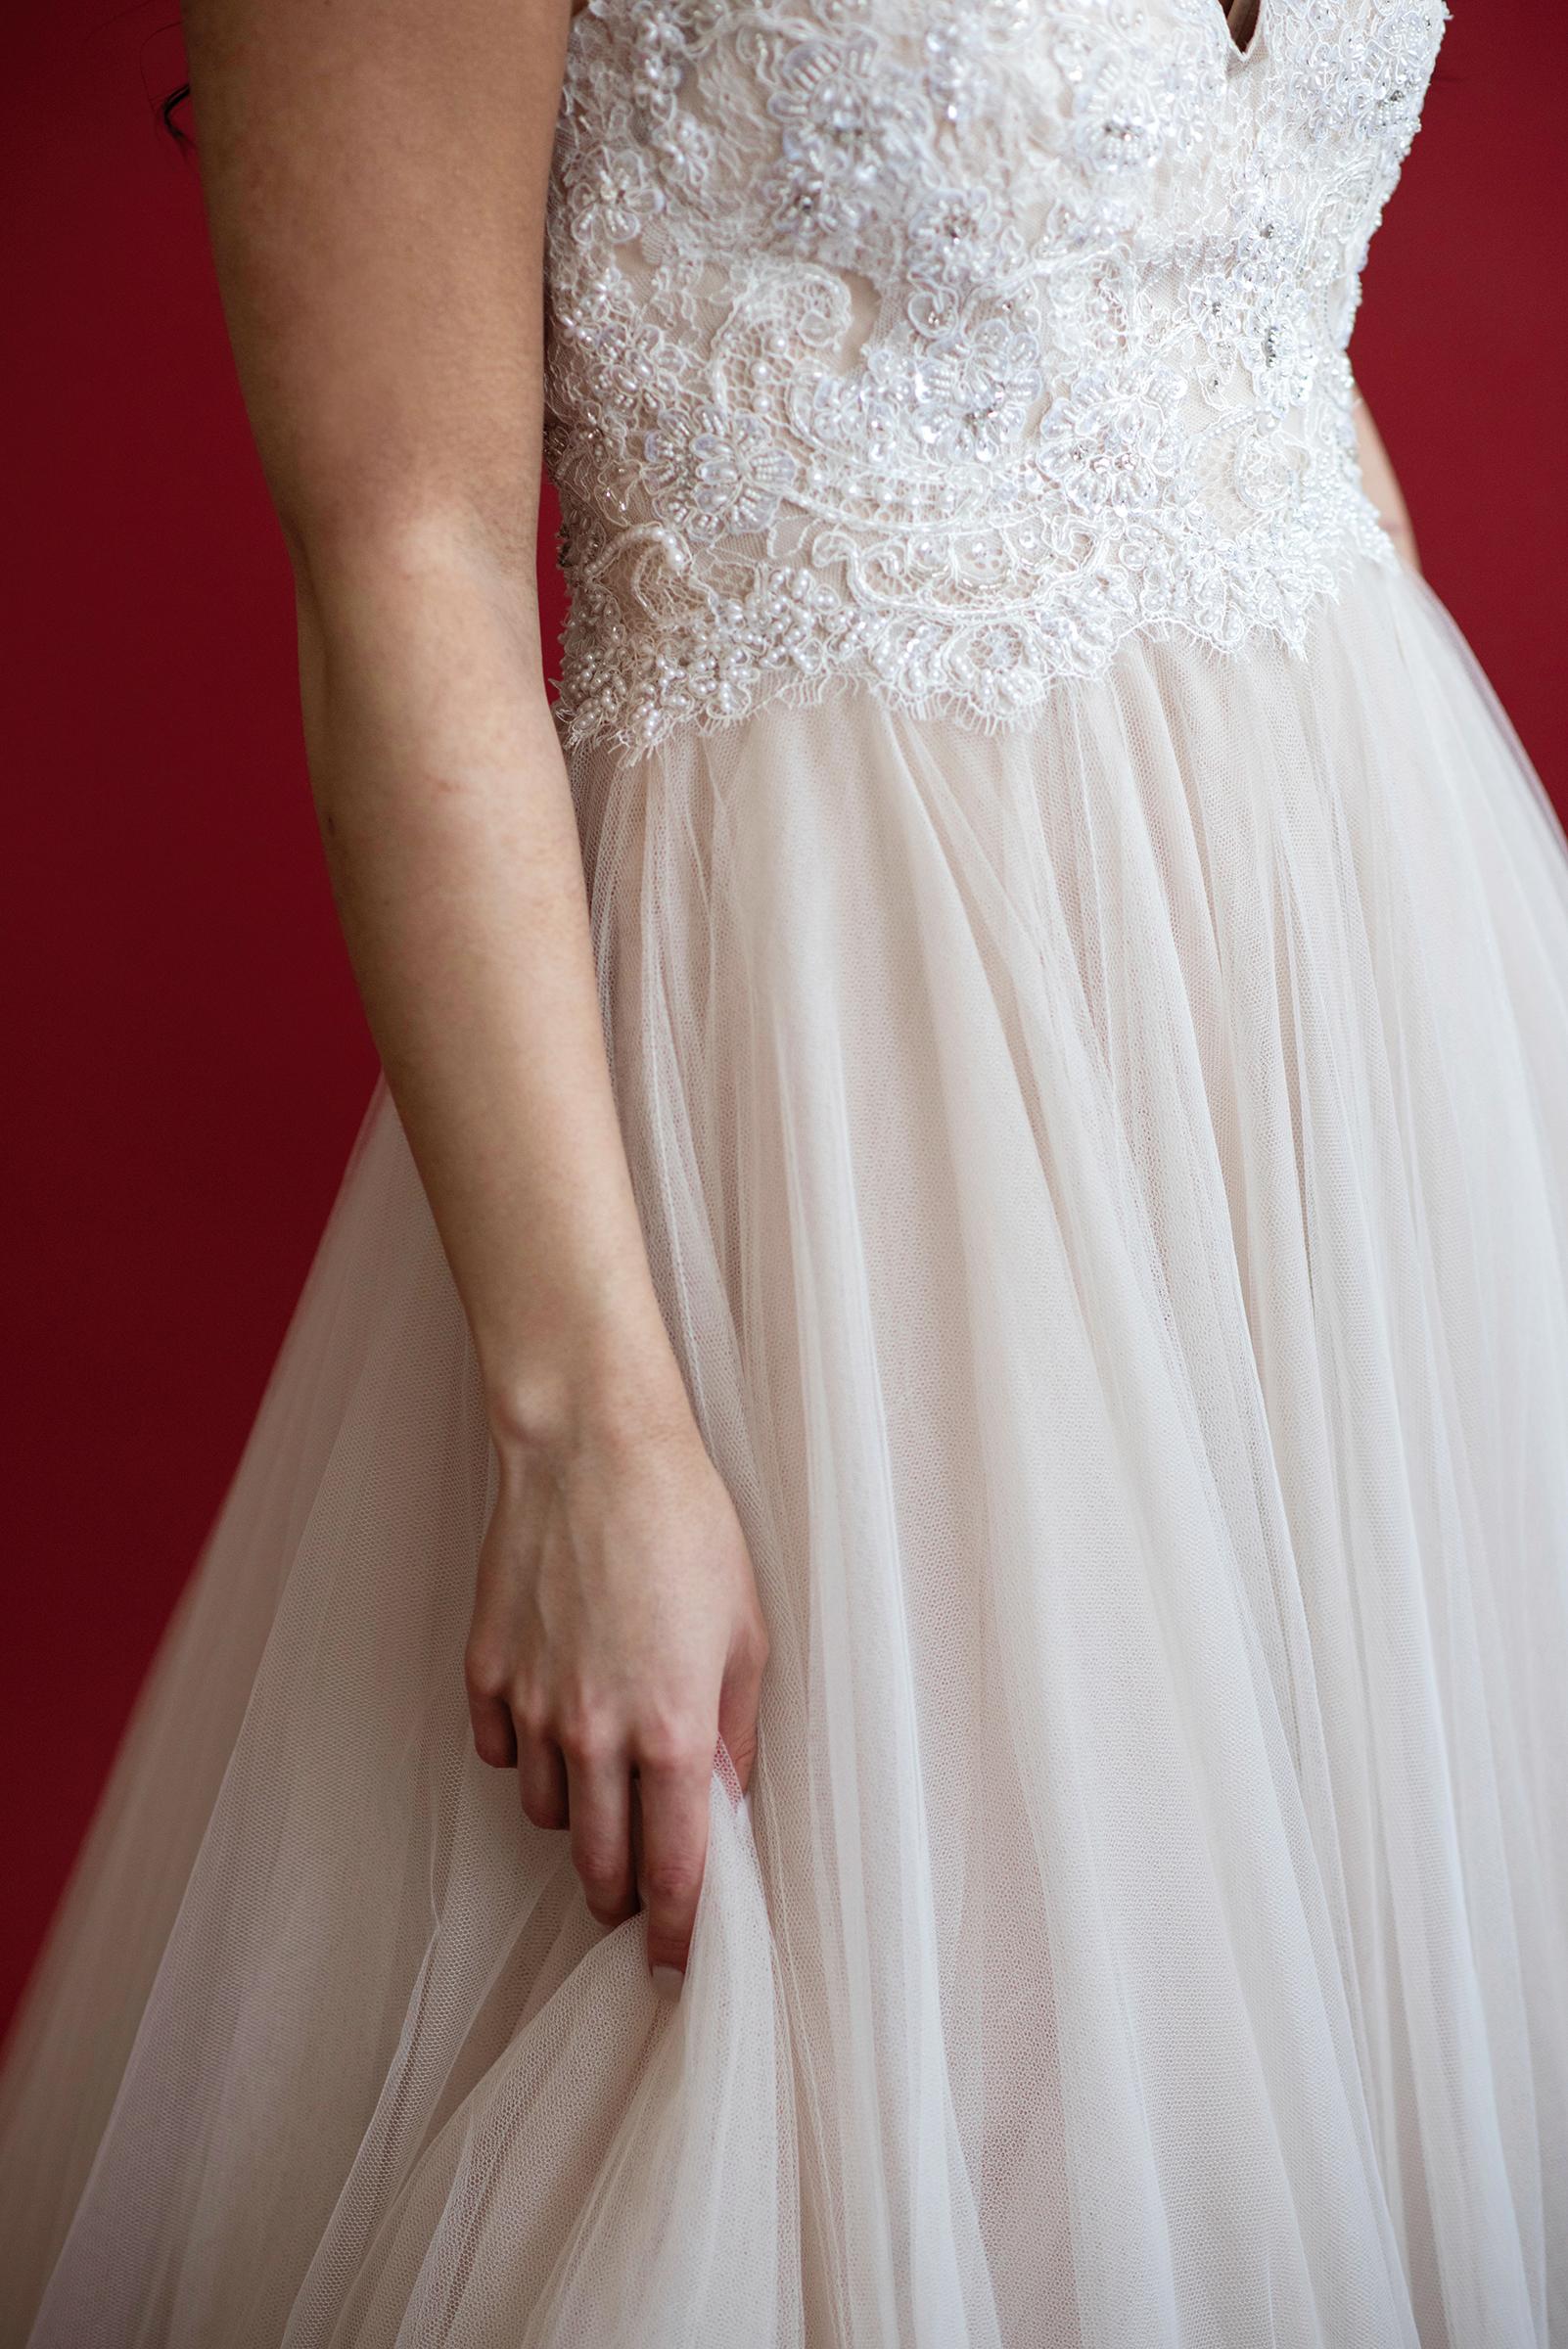 Stephanie-Second Dress Details-10.jpg